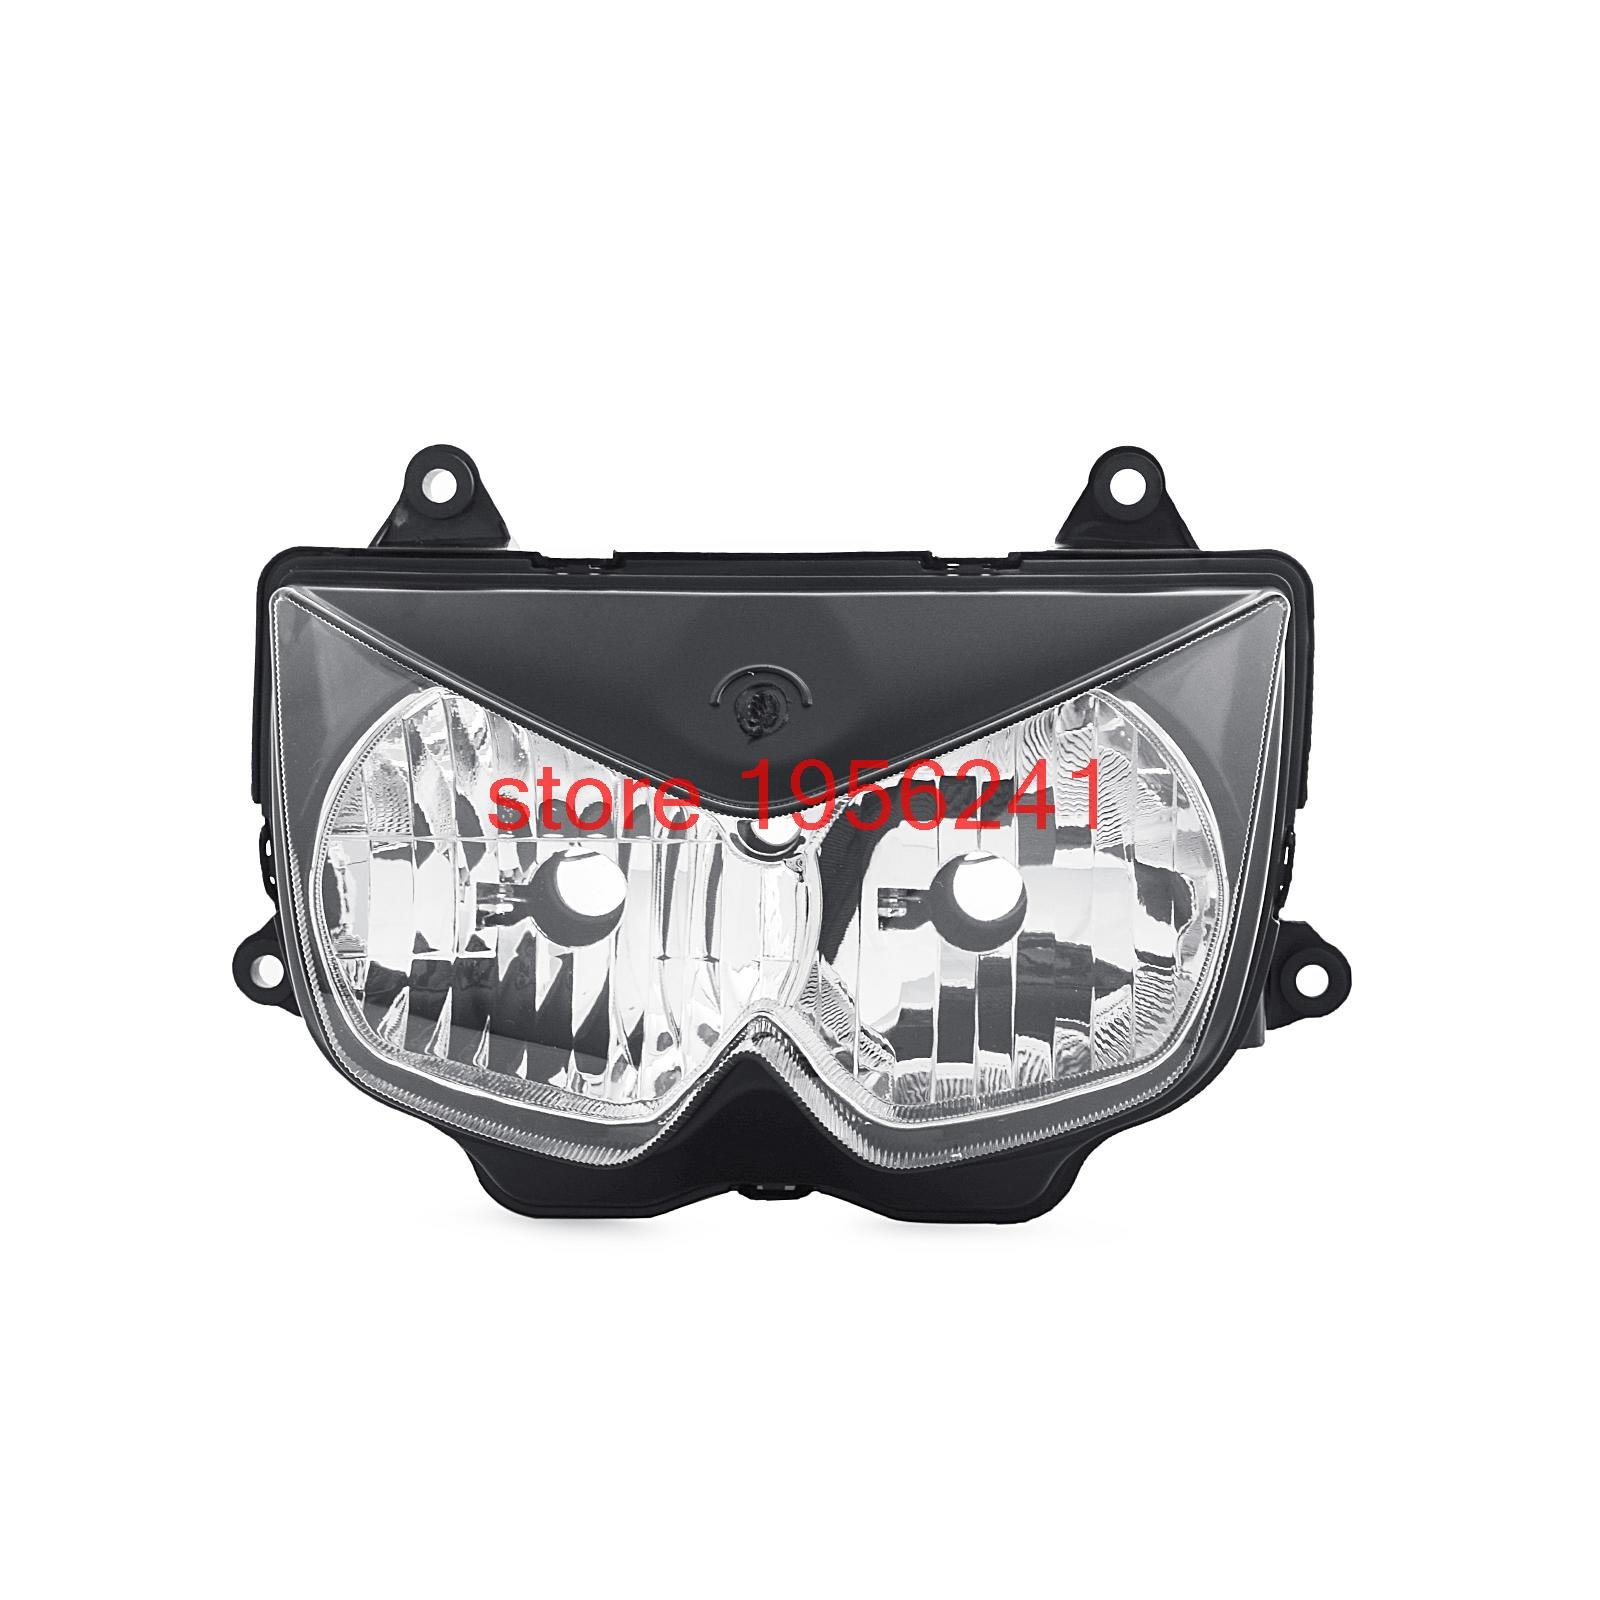 High Quality Motorcycle  Clear Lens Headlight Headlamp For Kawasaki Ninja 250R EX250 2008 2009 2010 2011 2012